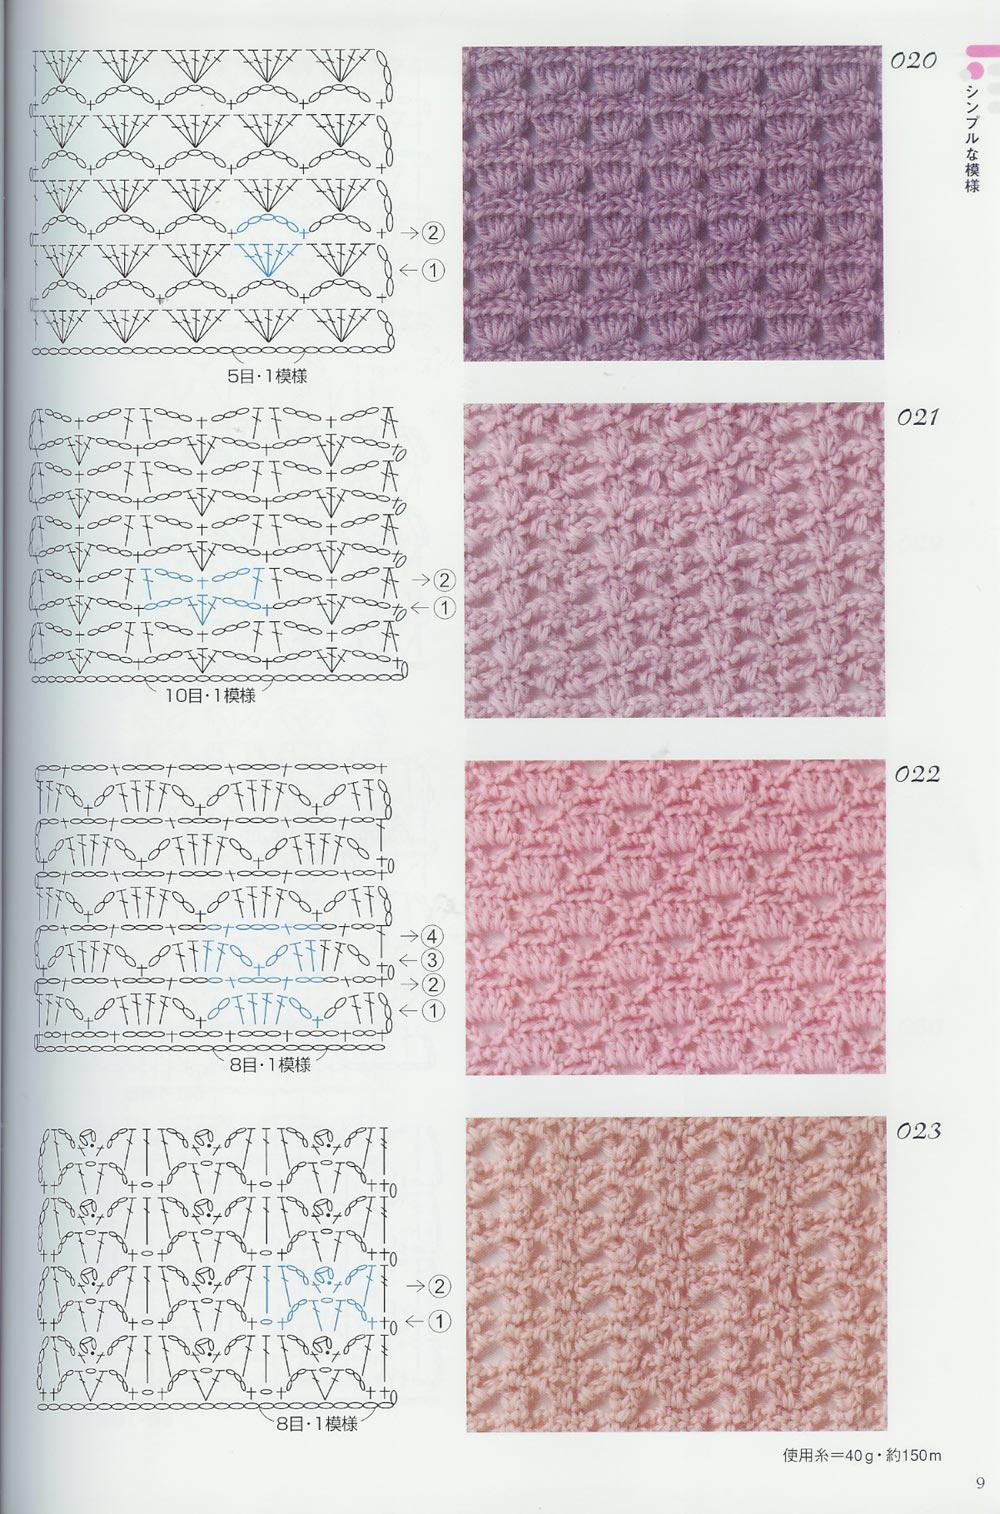 Crochet Stitches Book : ... Pinterest Crochet stitches, Patrones and Crochet stitches patterns